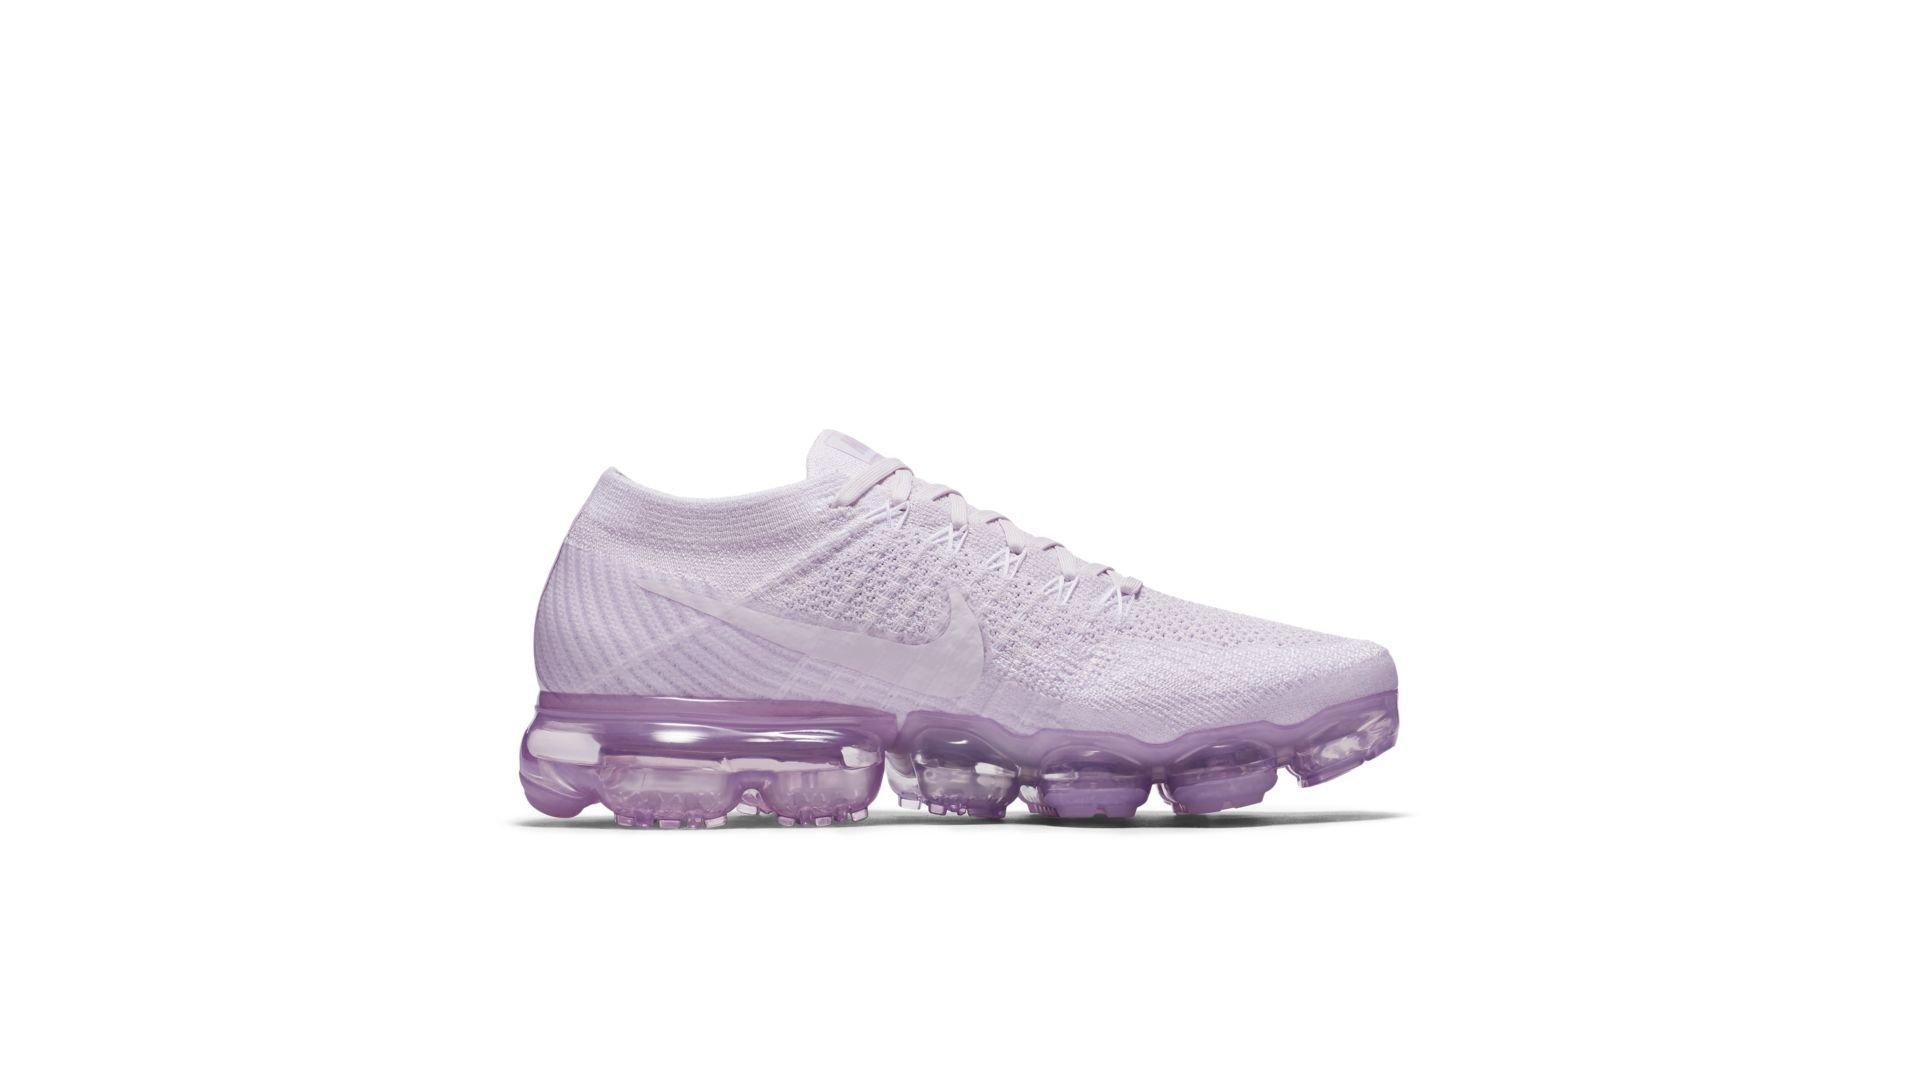 Nike Air Vapormax Light Violet W (849557-501)